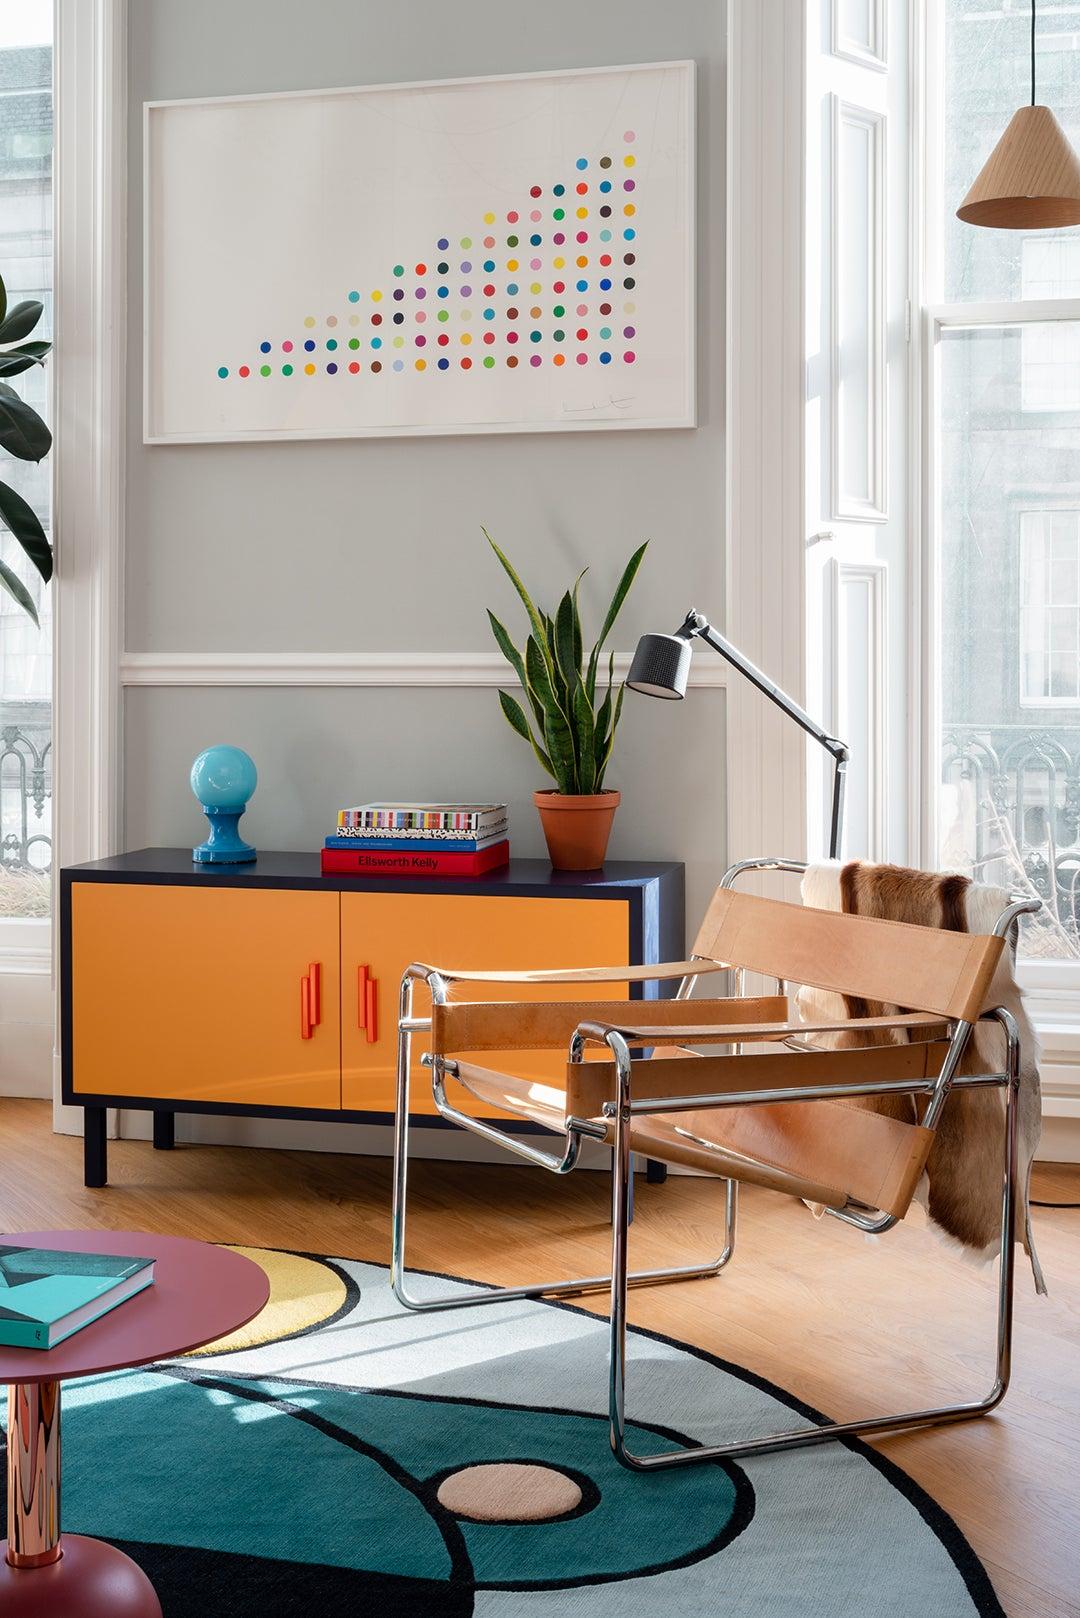 Sam Buckley's Edinburgh apartment